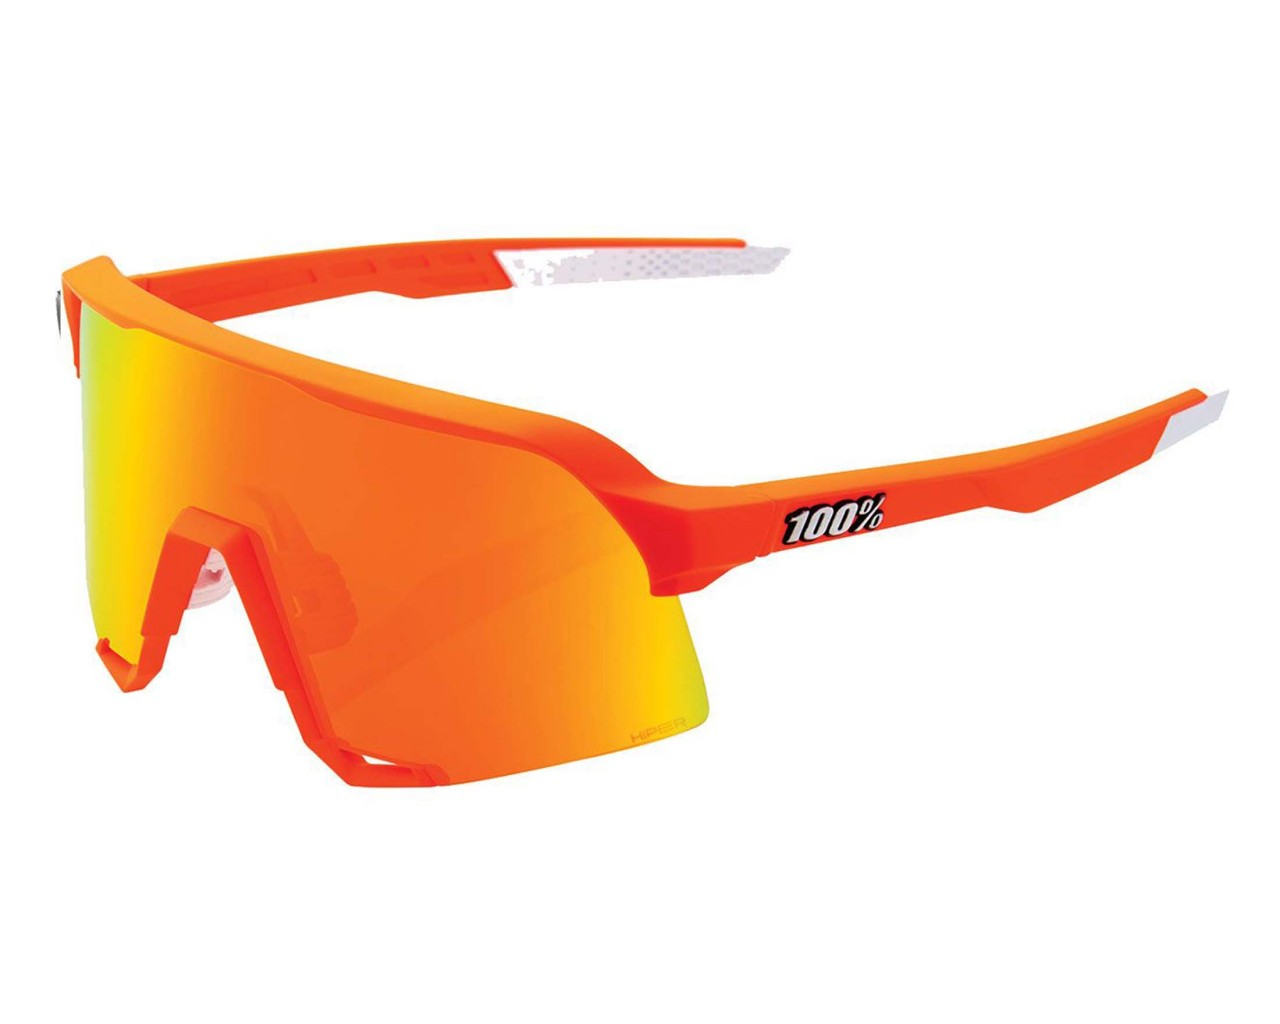 100% S3 - Hiper Mirror Lens Sports Sunglasses | neon orange